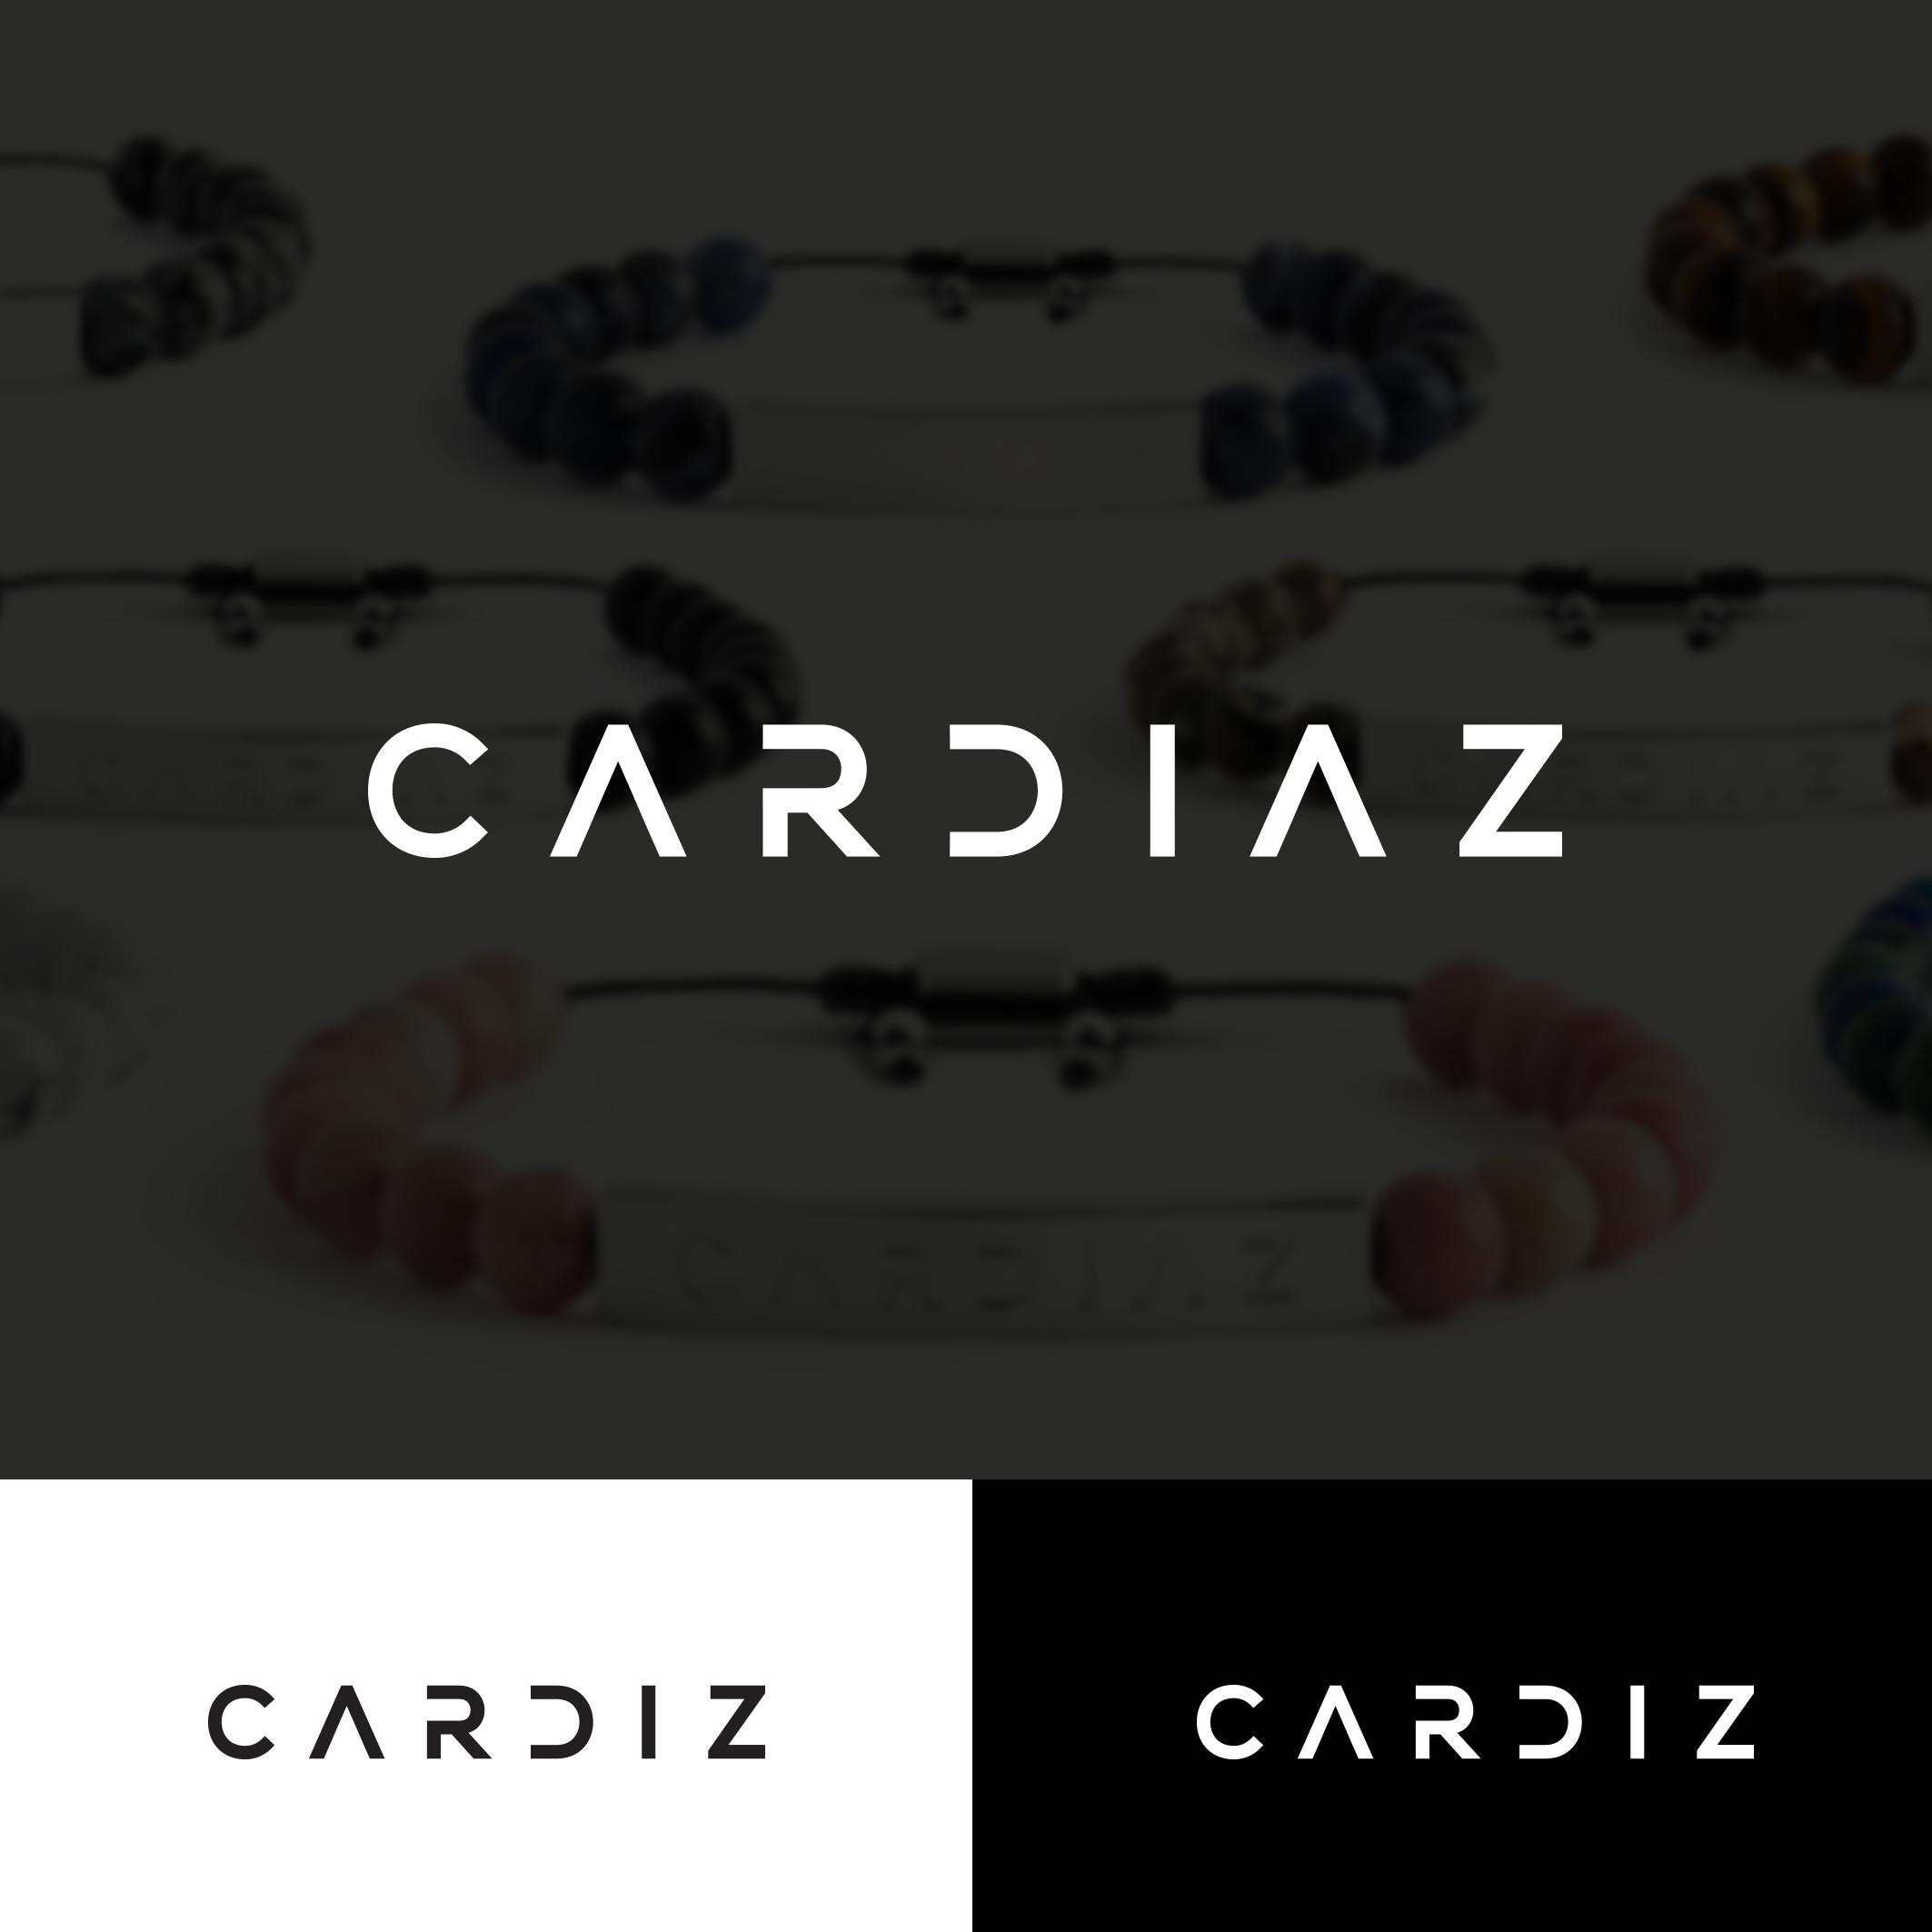 Cardiaz webshop